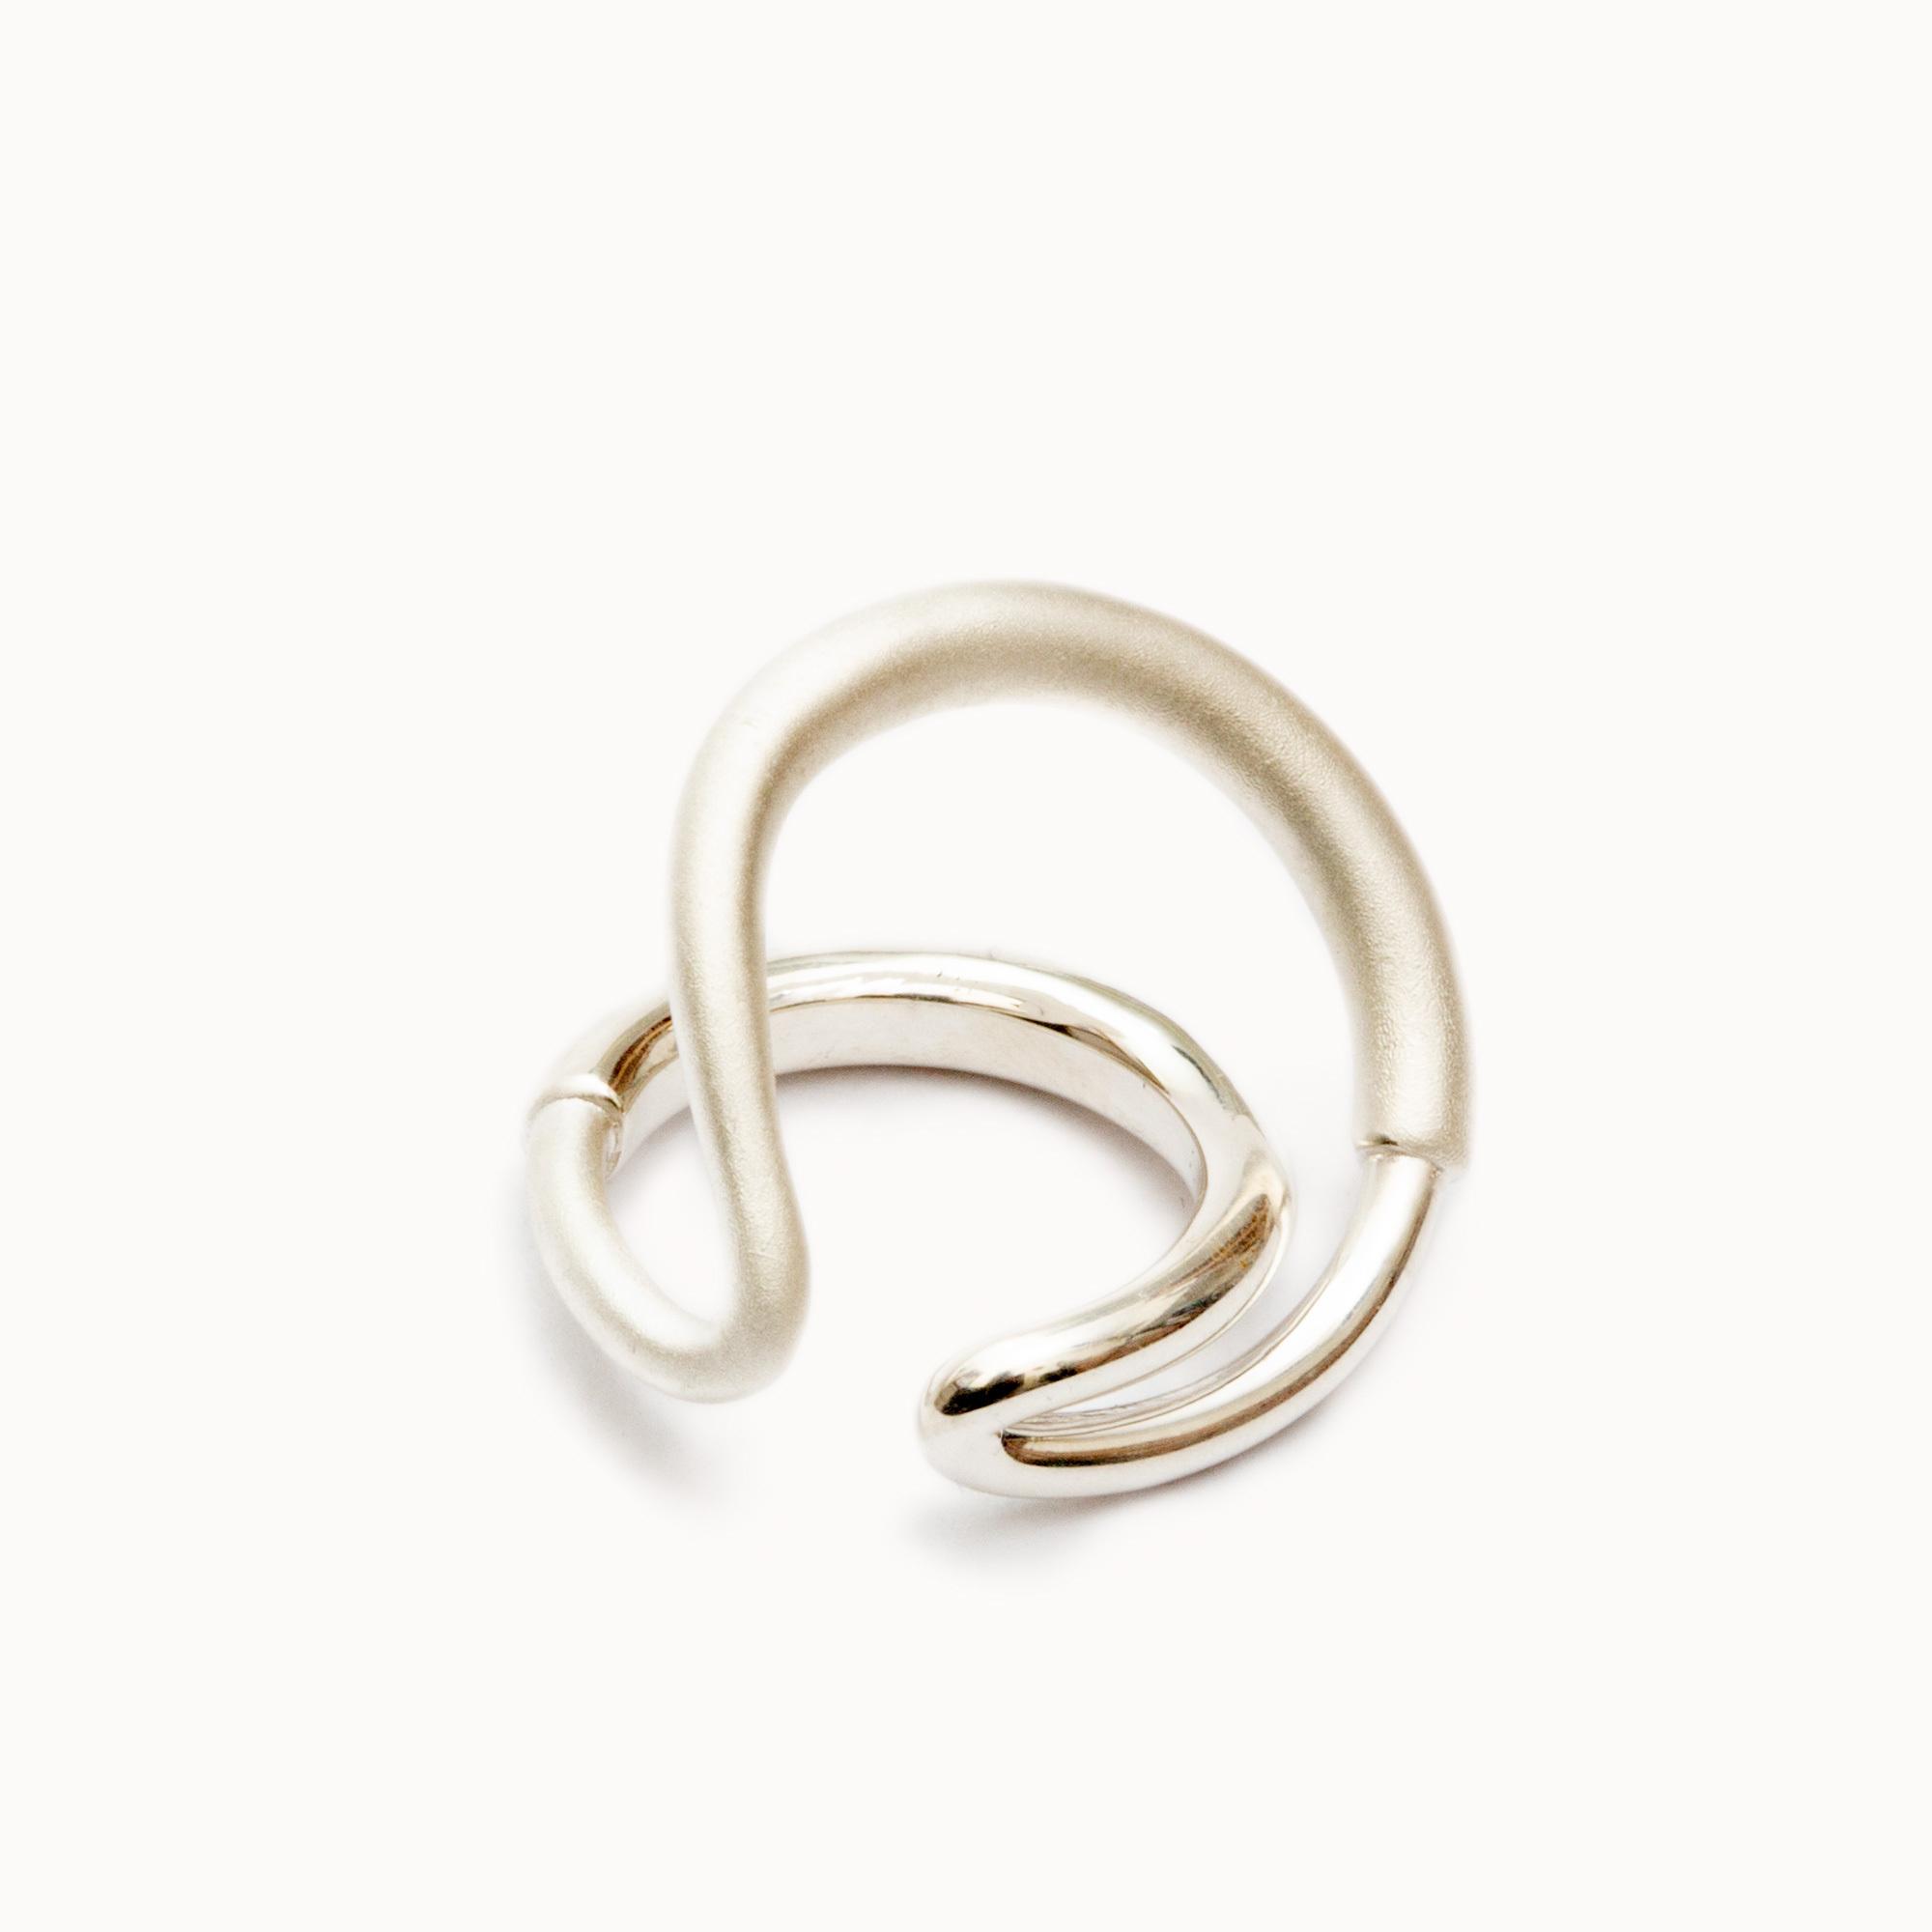 Ear Cuff M|イヤーカフ - art.2001C031010